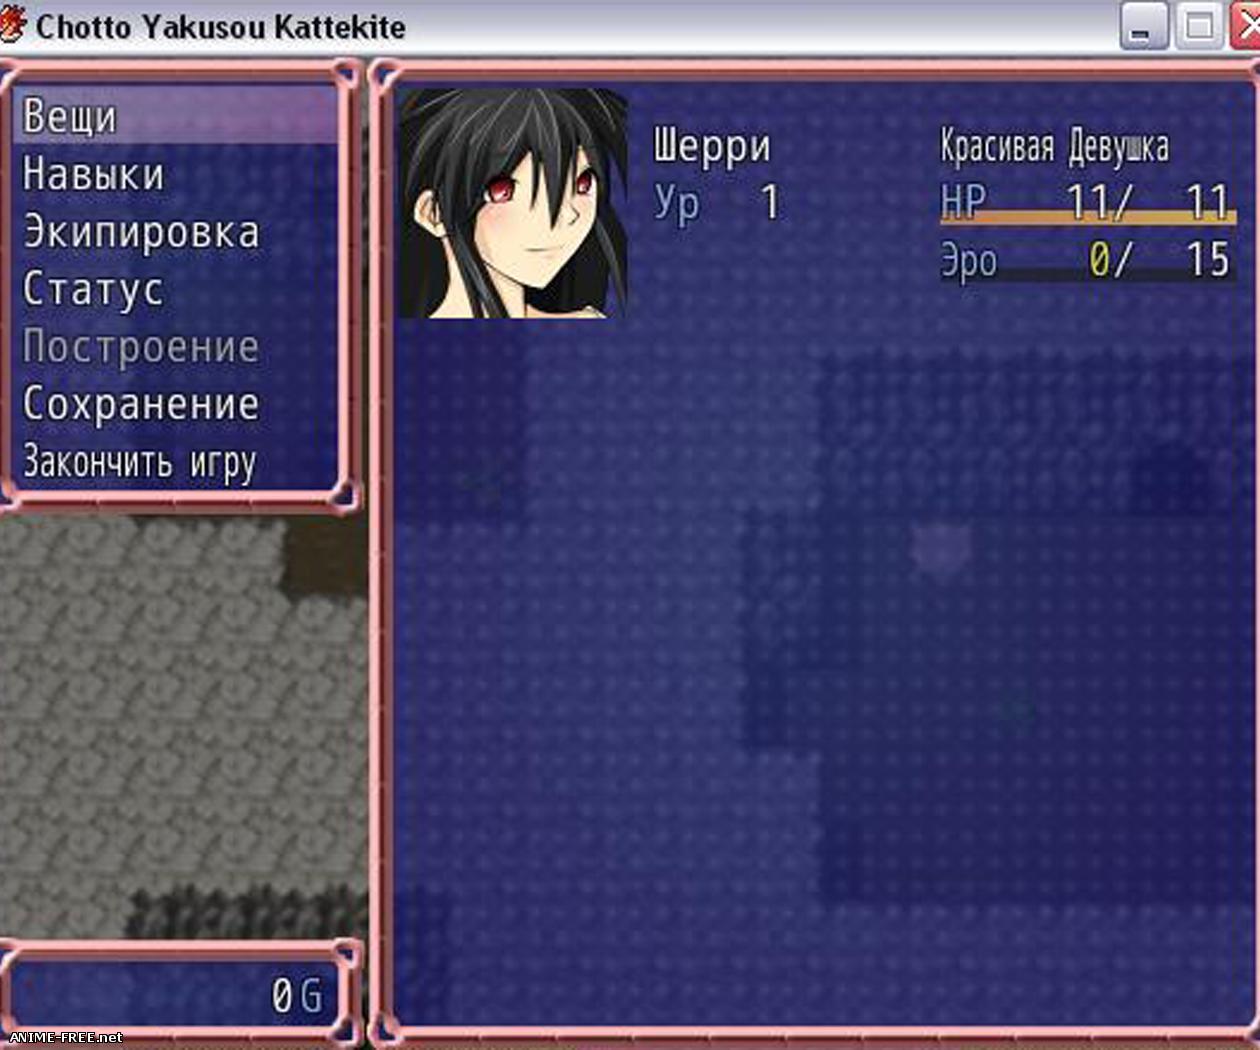 Chotto Yakusou Kattekite [2012] [Cen] [jRPG] [RUS] H-Game